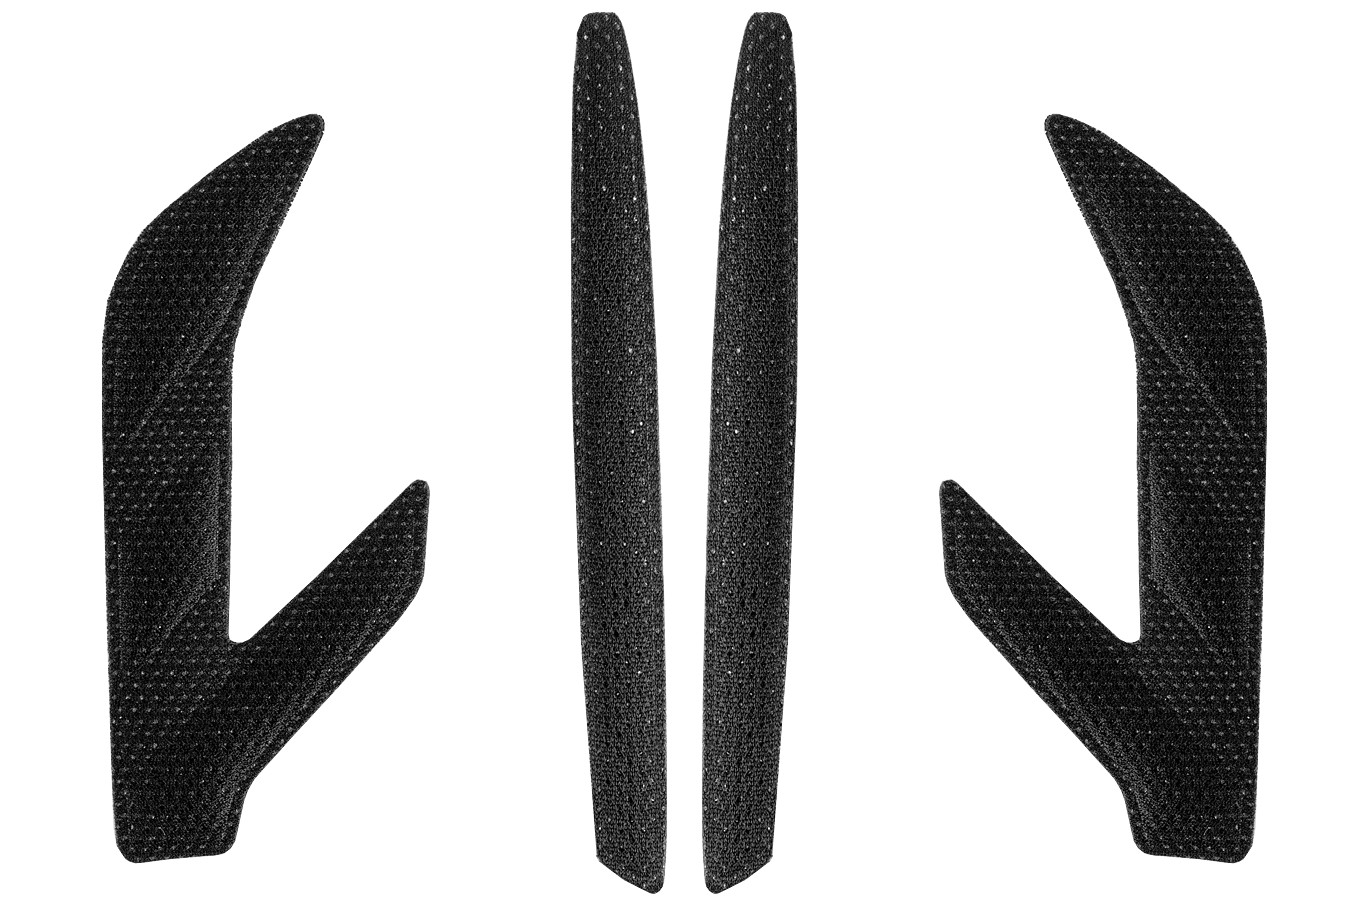 Kit Forro (Espuma) Para Capacete Foray - Giro